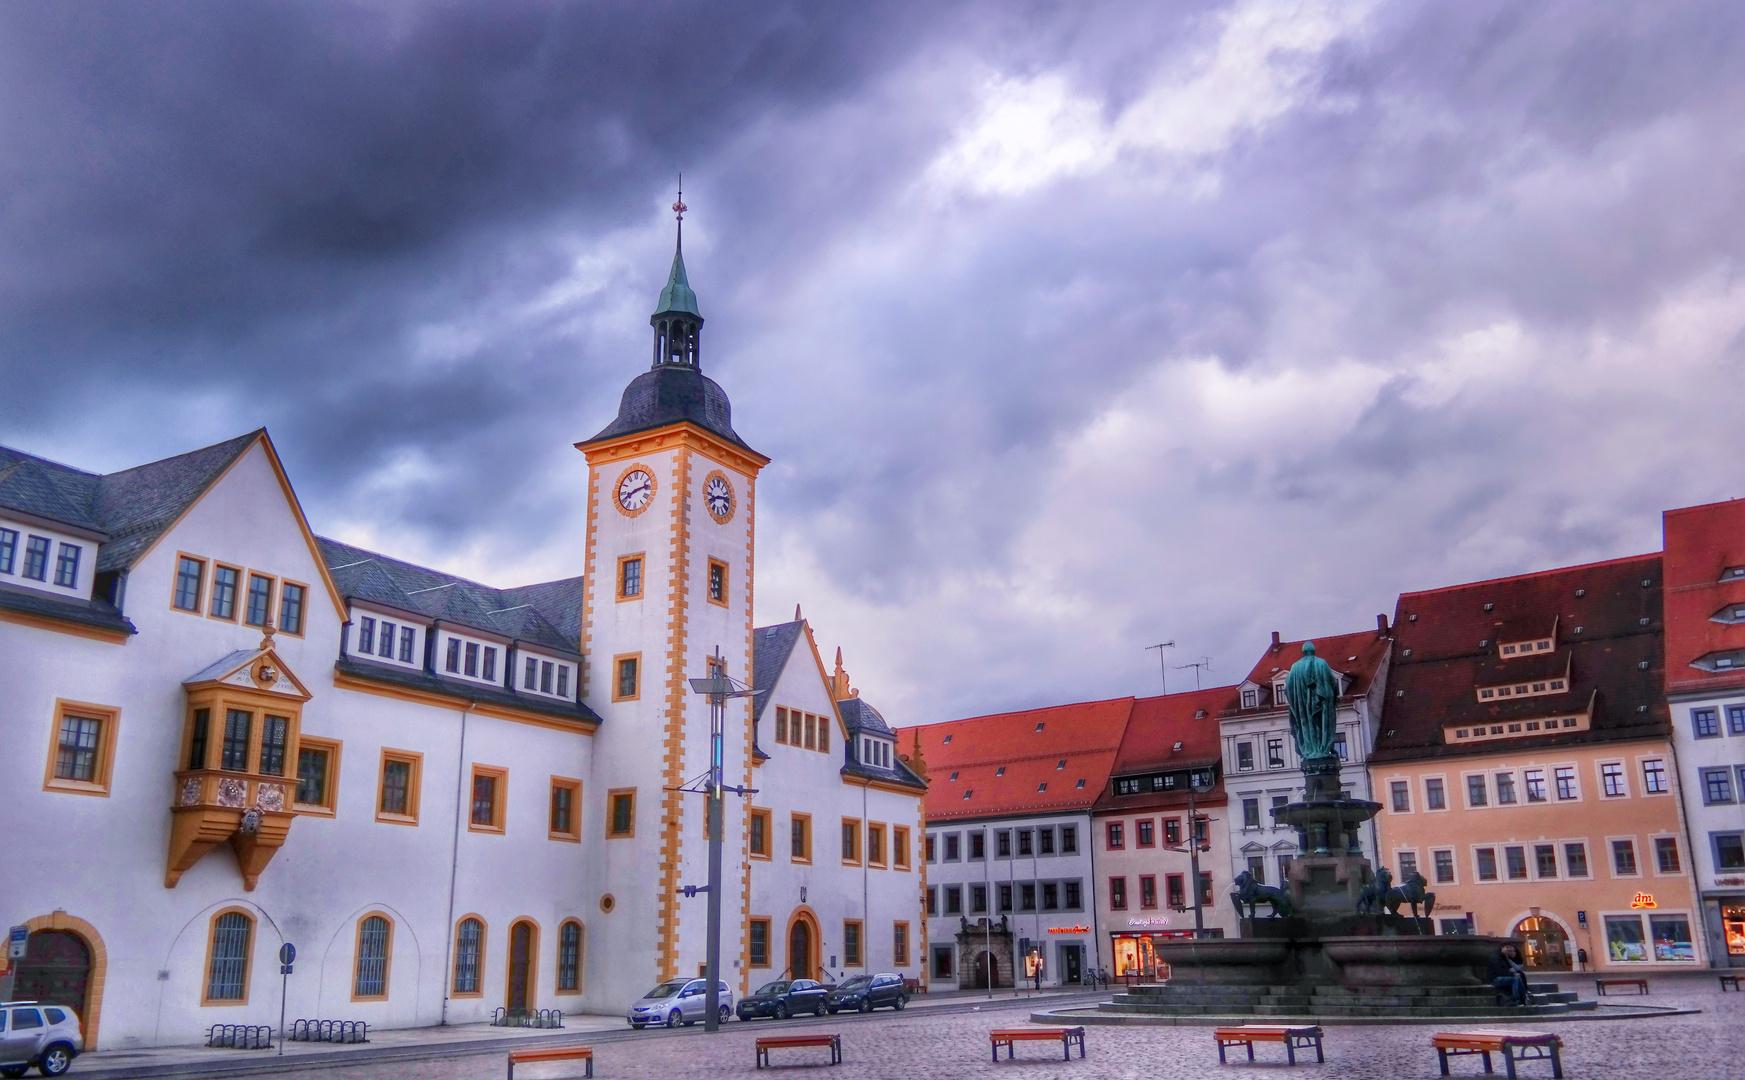 Freiberger Rathaus